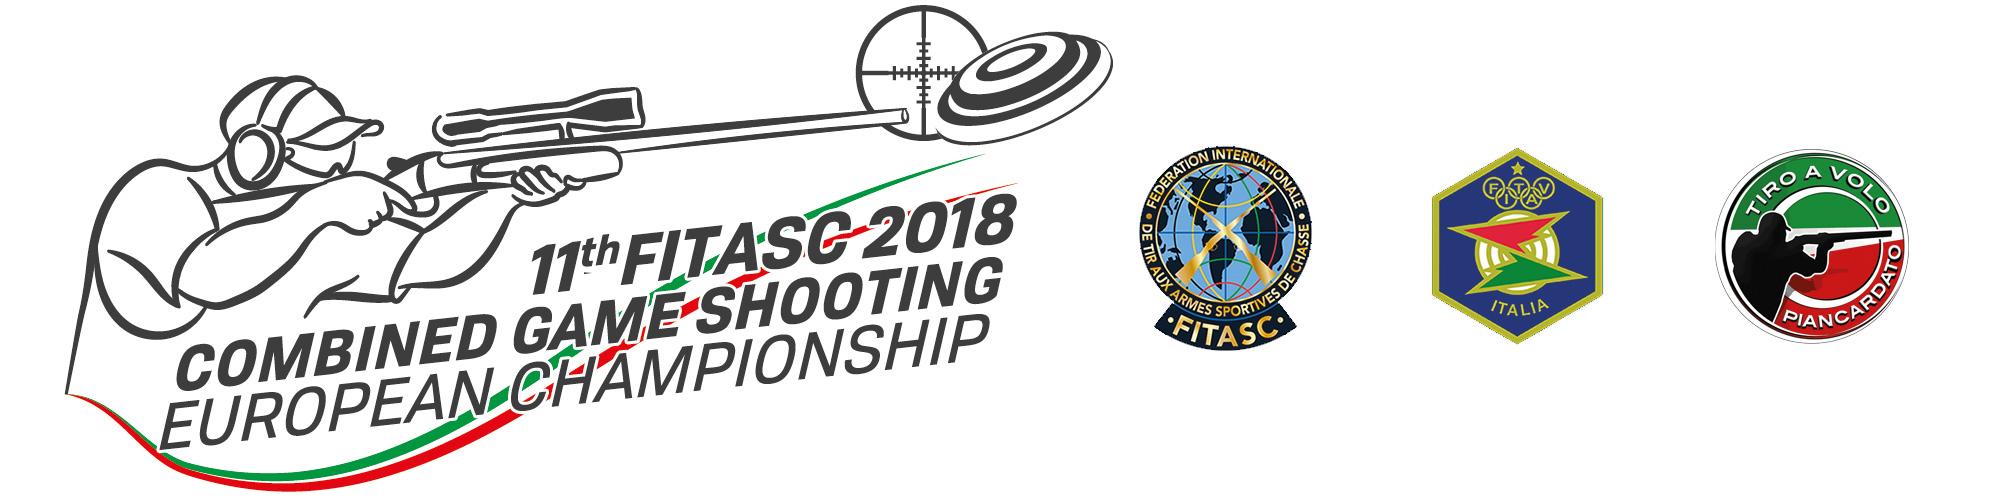 European Fitasc Championship 2018